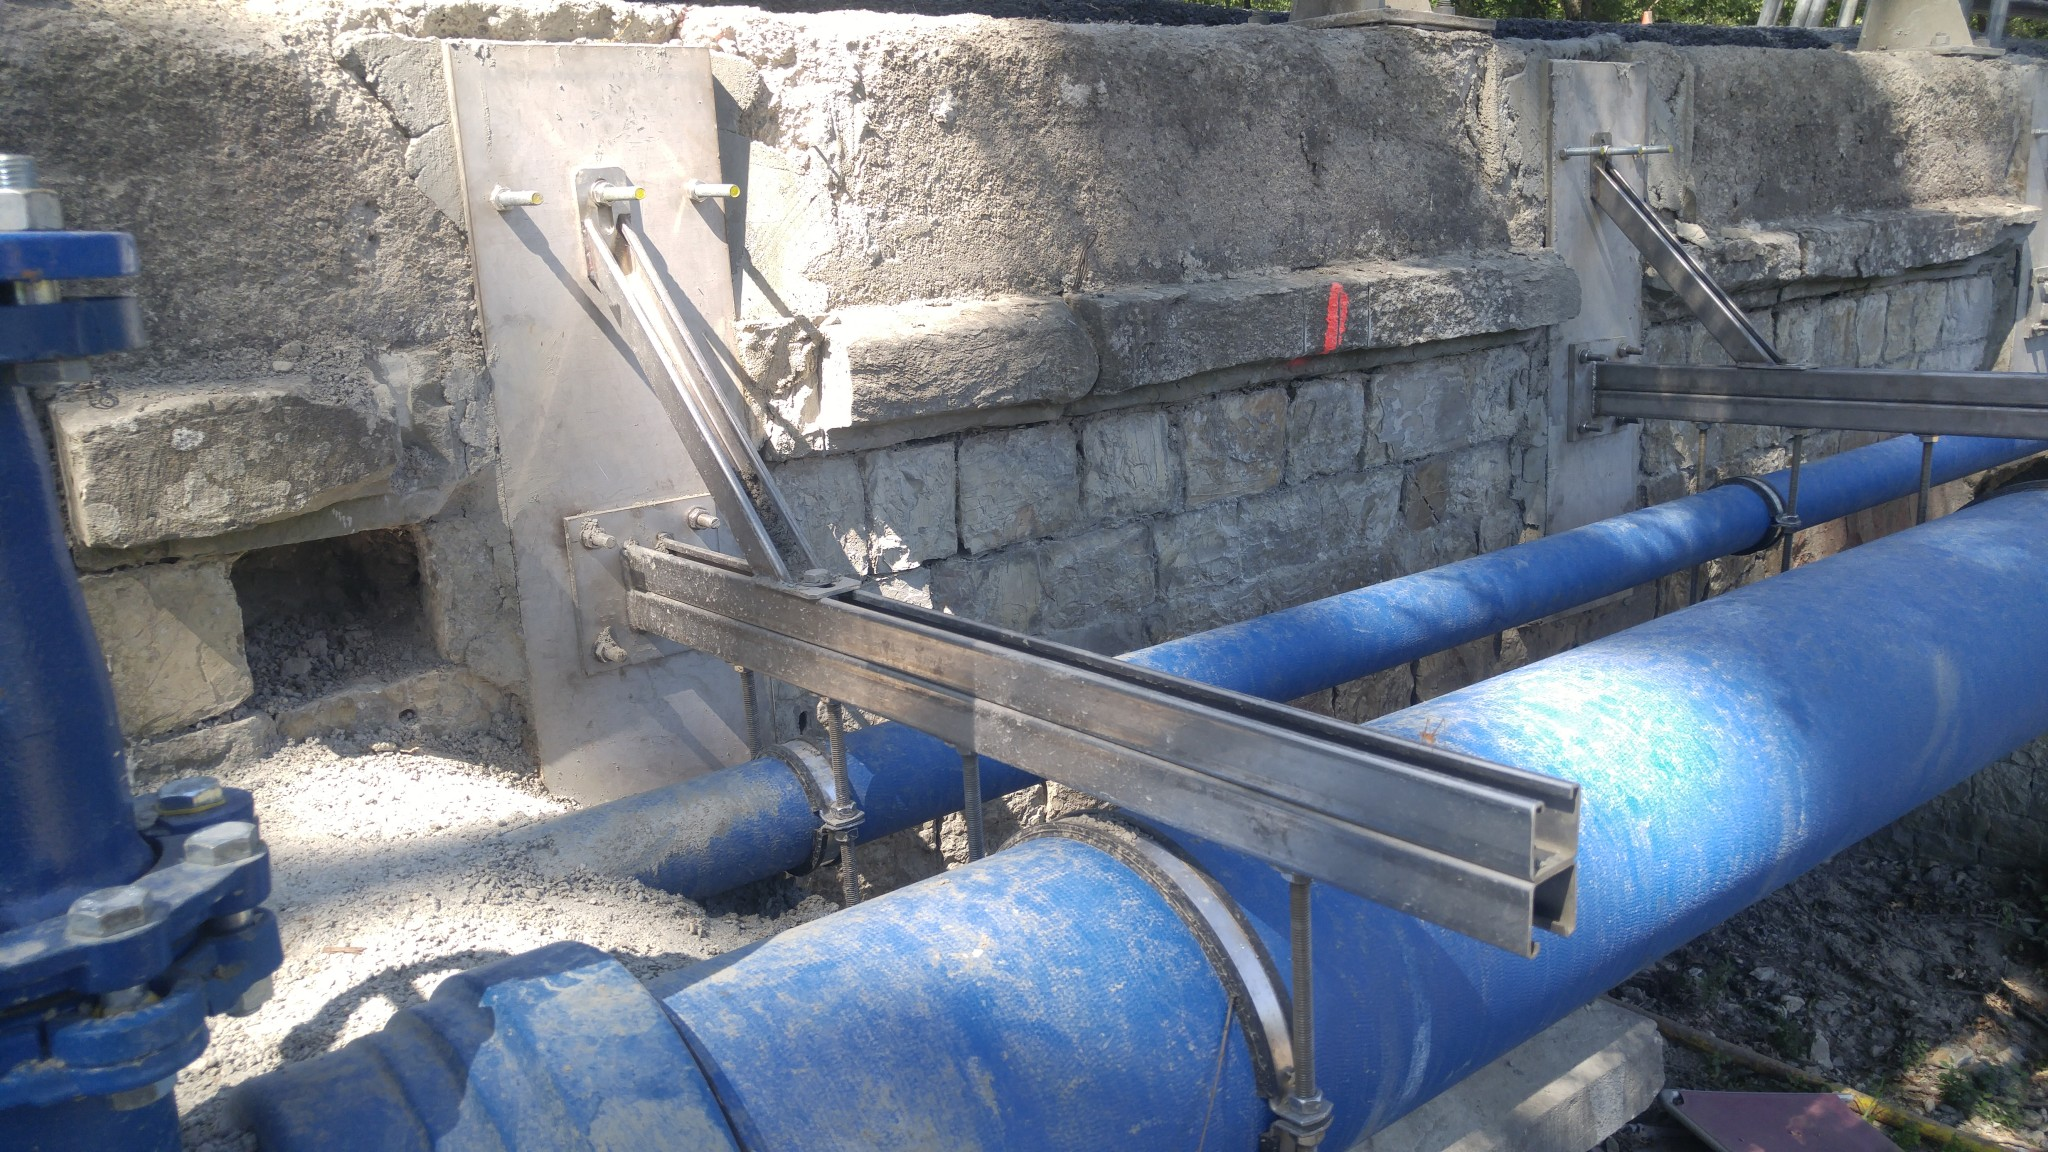 Work done at the Impruneta's bridge